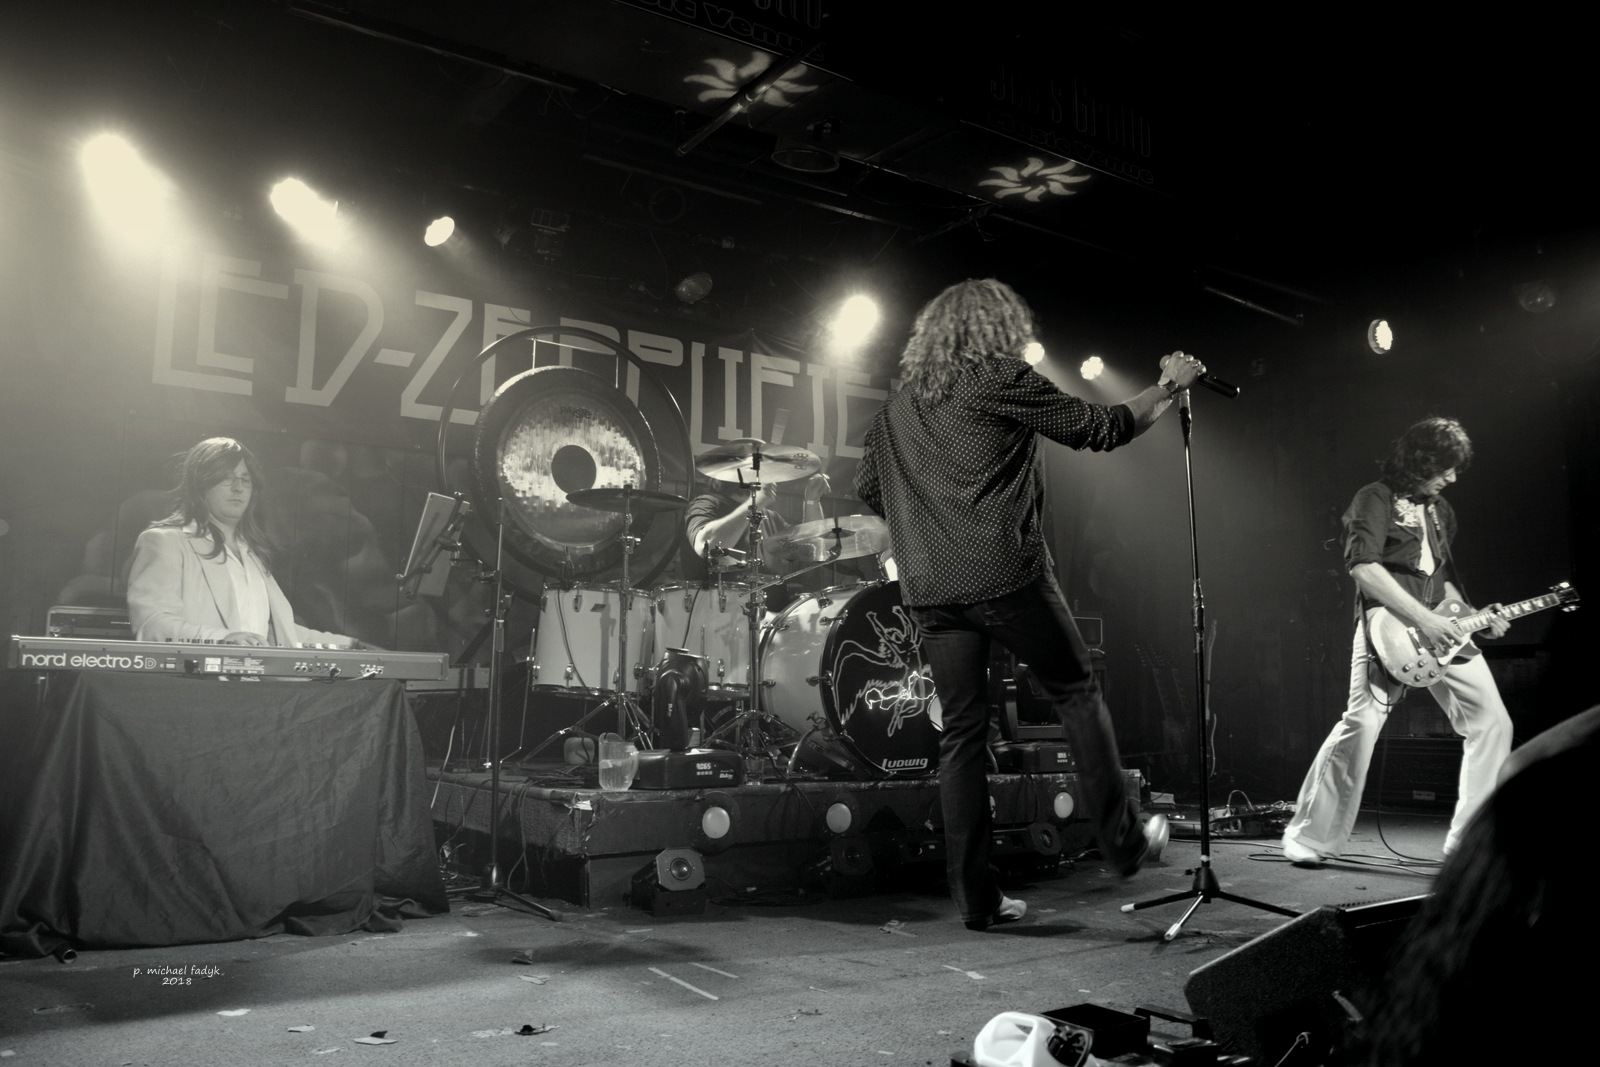 led zeppelin tribute band 6 by P. Michael Fadyk